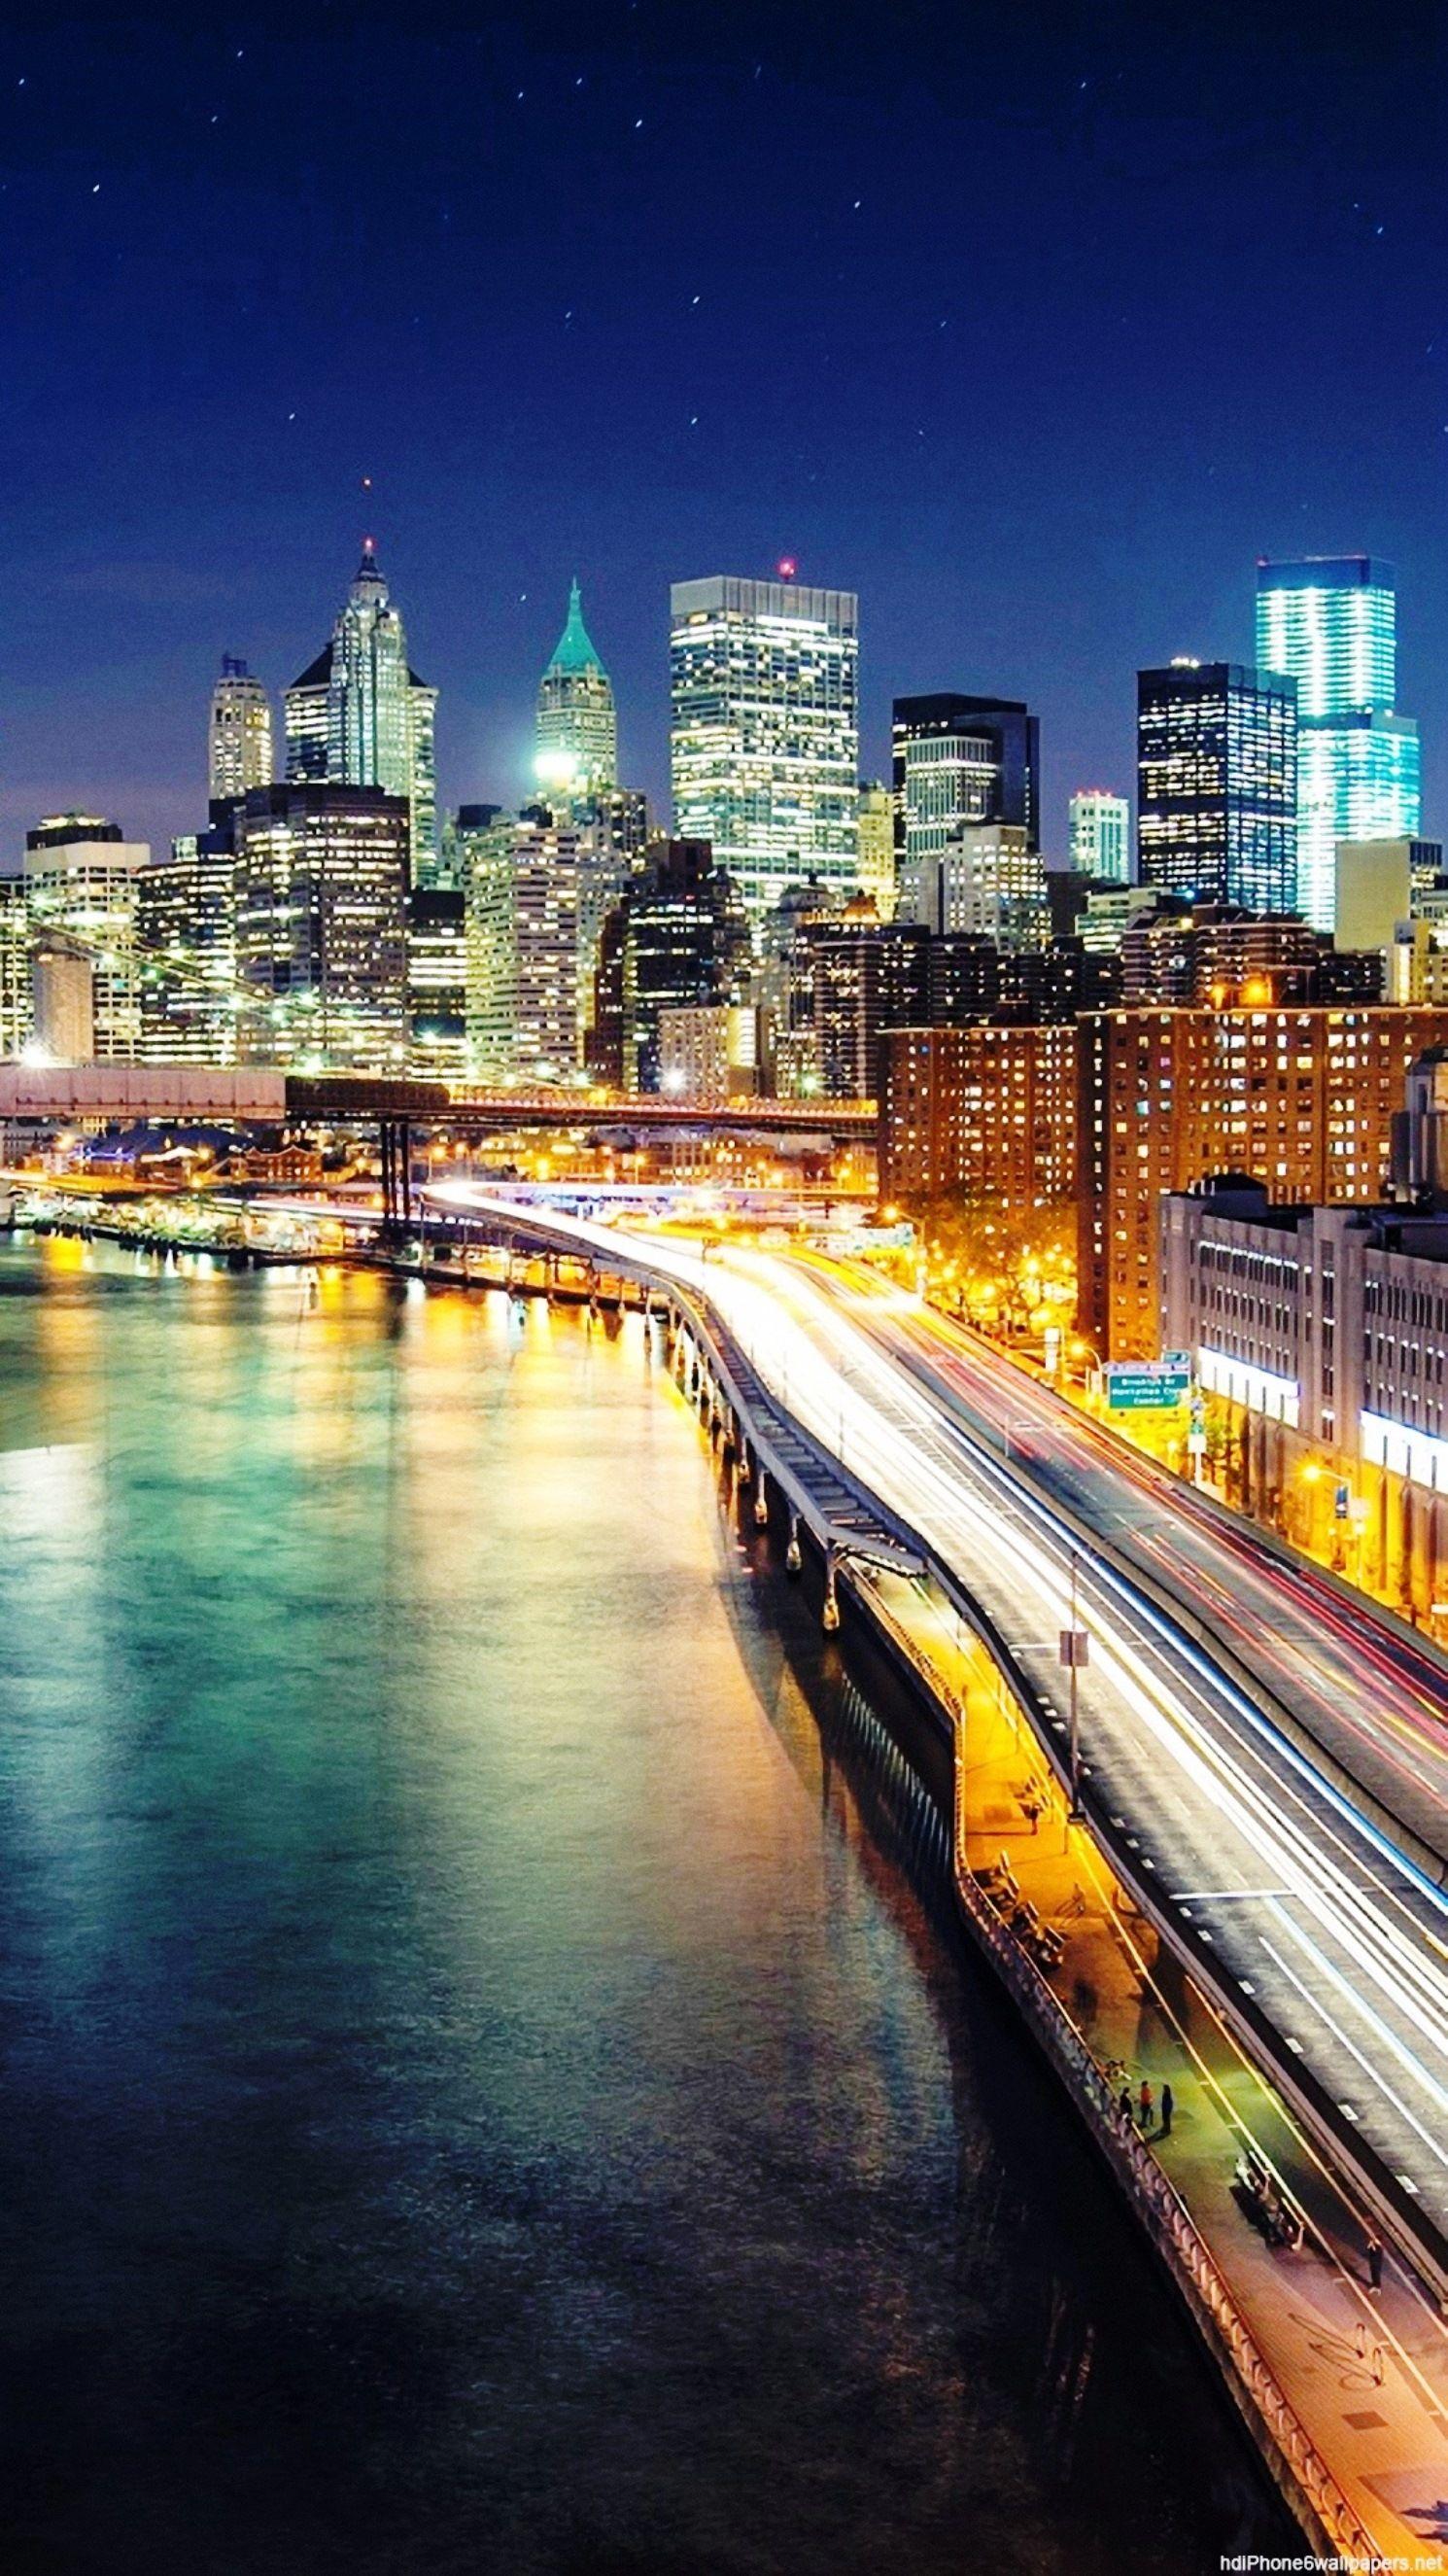 City Background Hd : background, Night, Lights, Bridge, Iphone, Wallpapers, Background, Portrait, 1490x2650, Download, Wallpaper, WallpaperTip